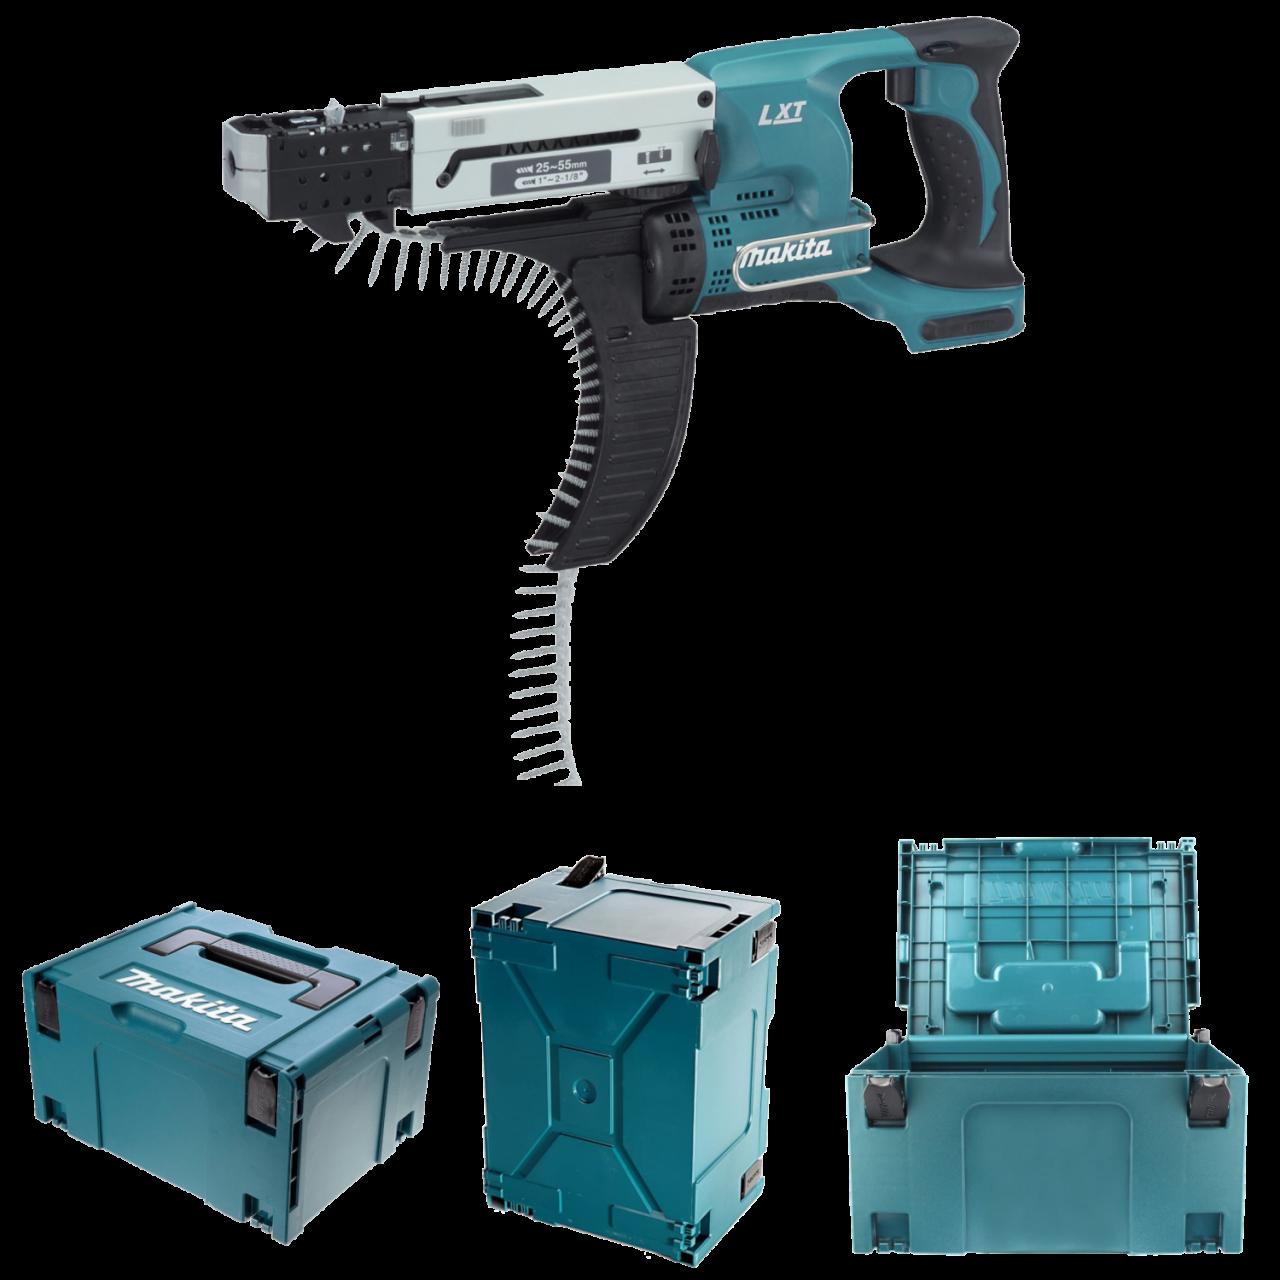 Makita DFR550ZJ Akku-Magazinschrauber im MAKPAC Gr. 3 inkl. Einlage, 18V, 25-55 mm, 4.000 min-1